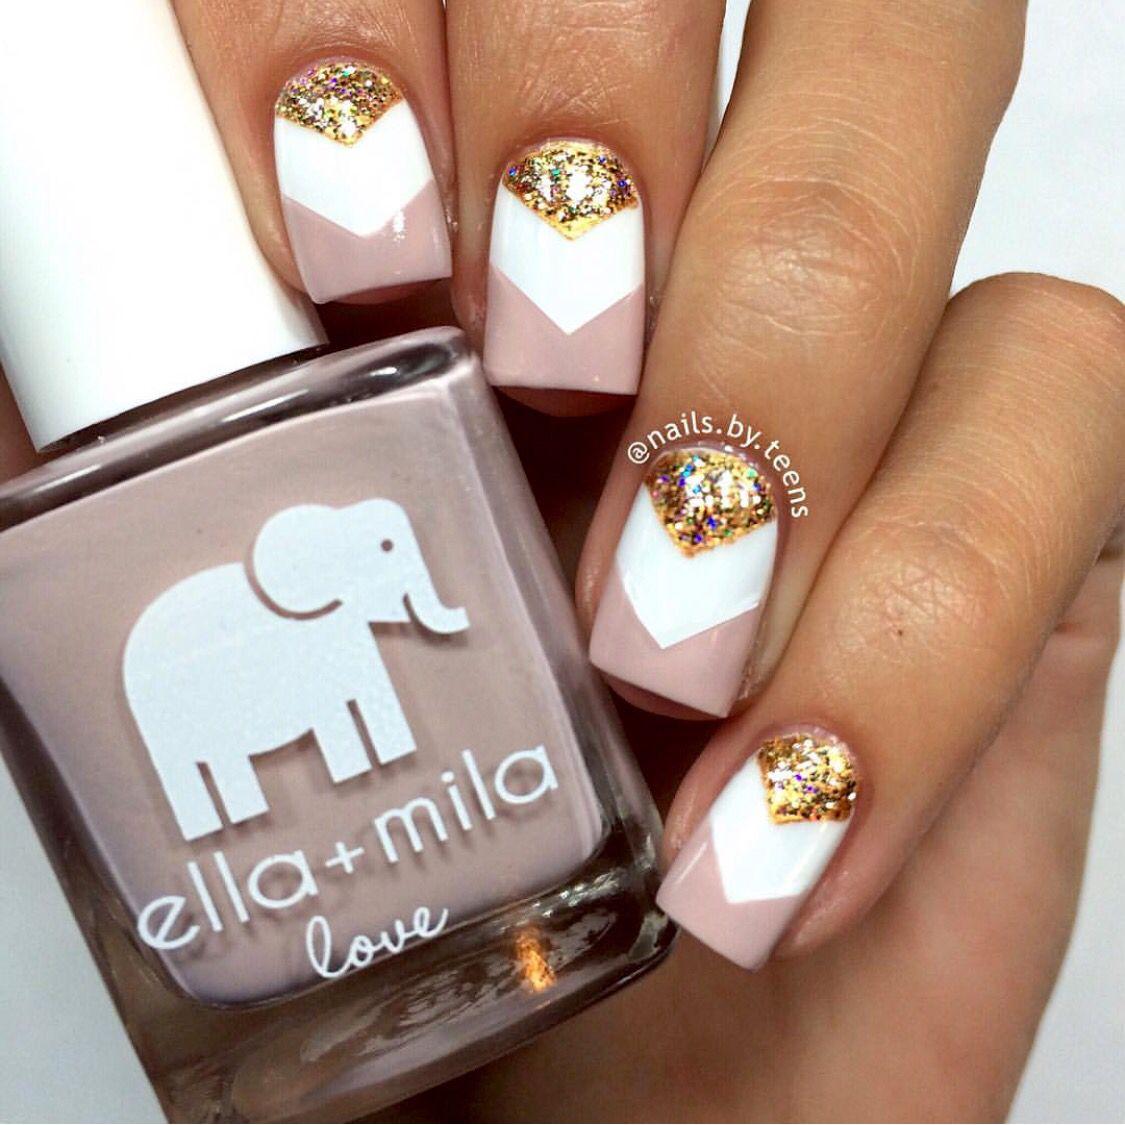 Ella+mila love   All Nails Baby...   Pinterest